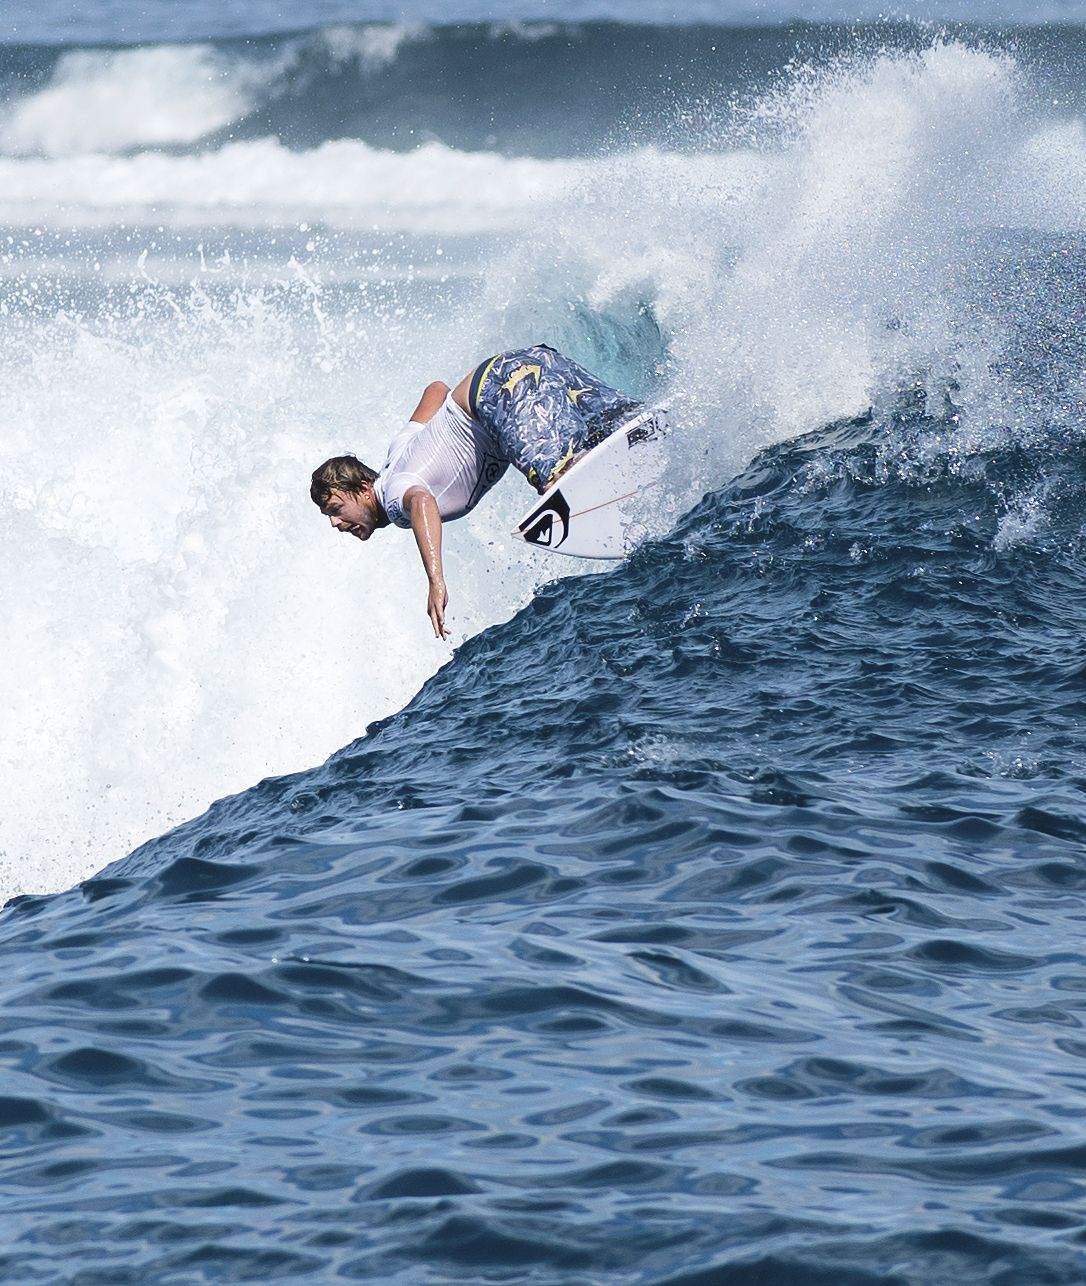 Wildcard Dane Reynolds in Round 1. #FijiPro